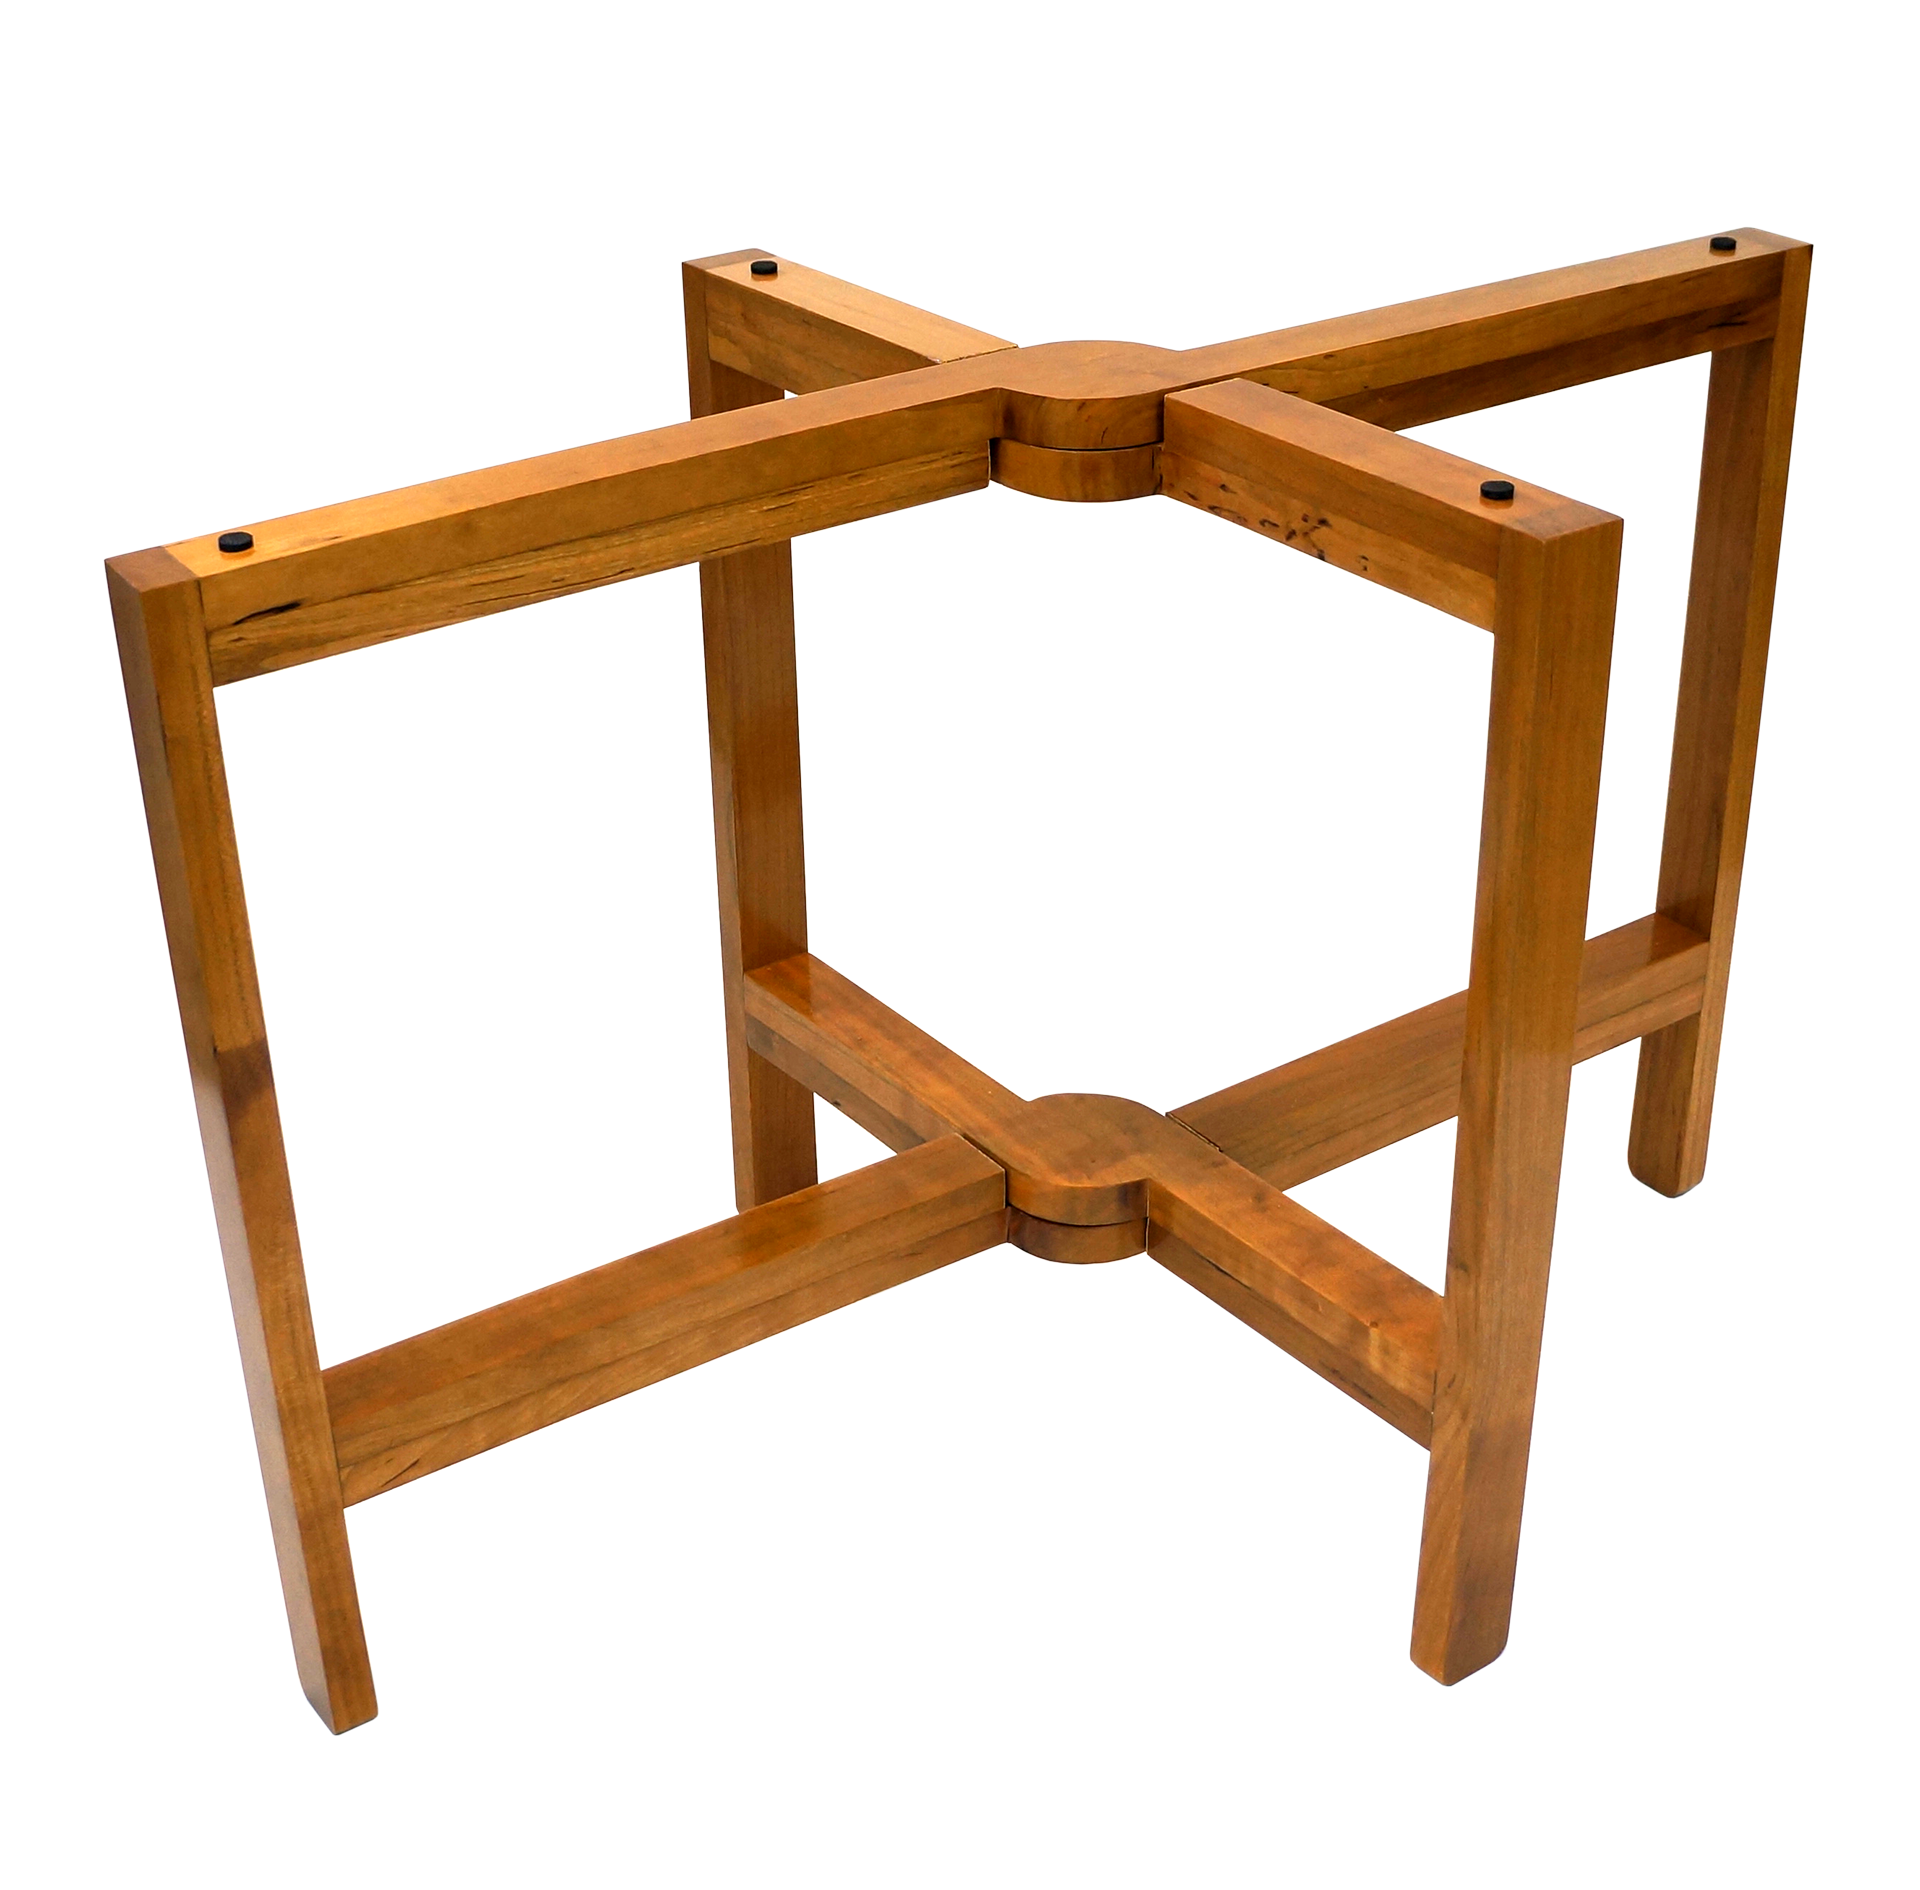 Folding table base 2.png